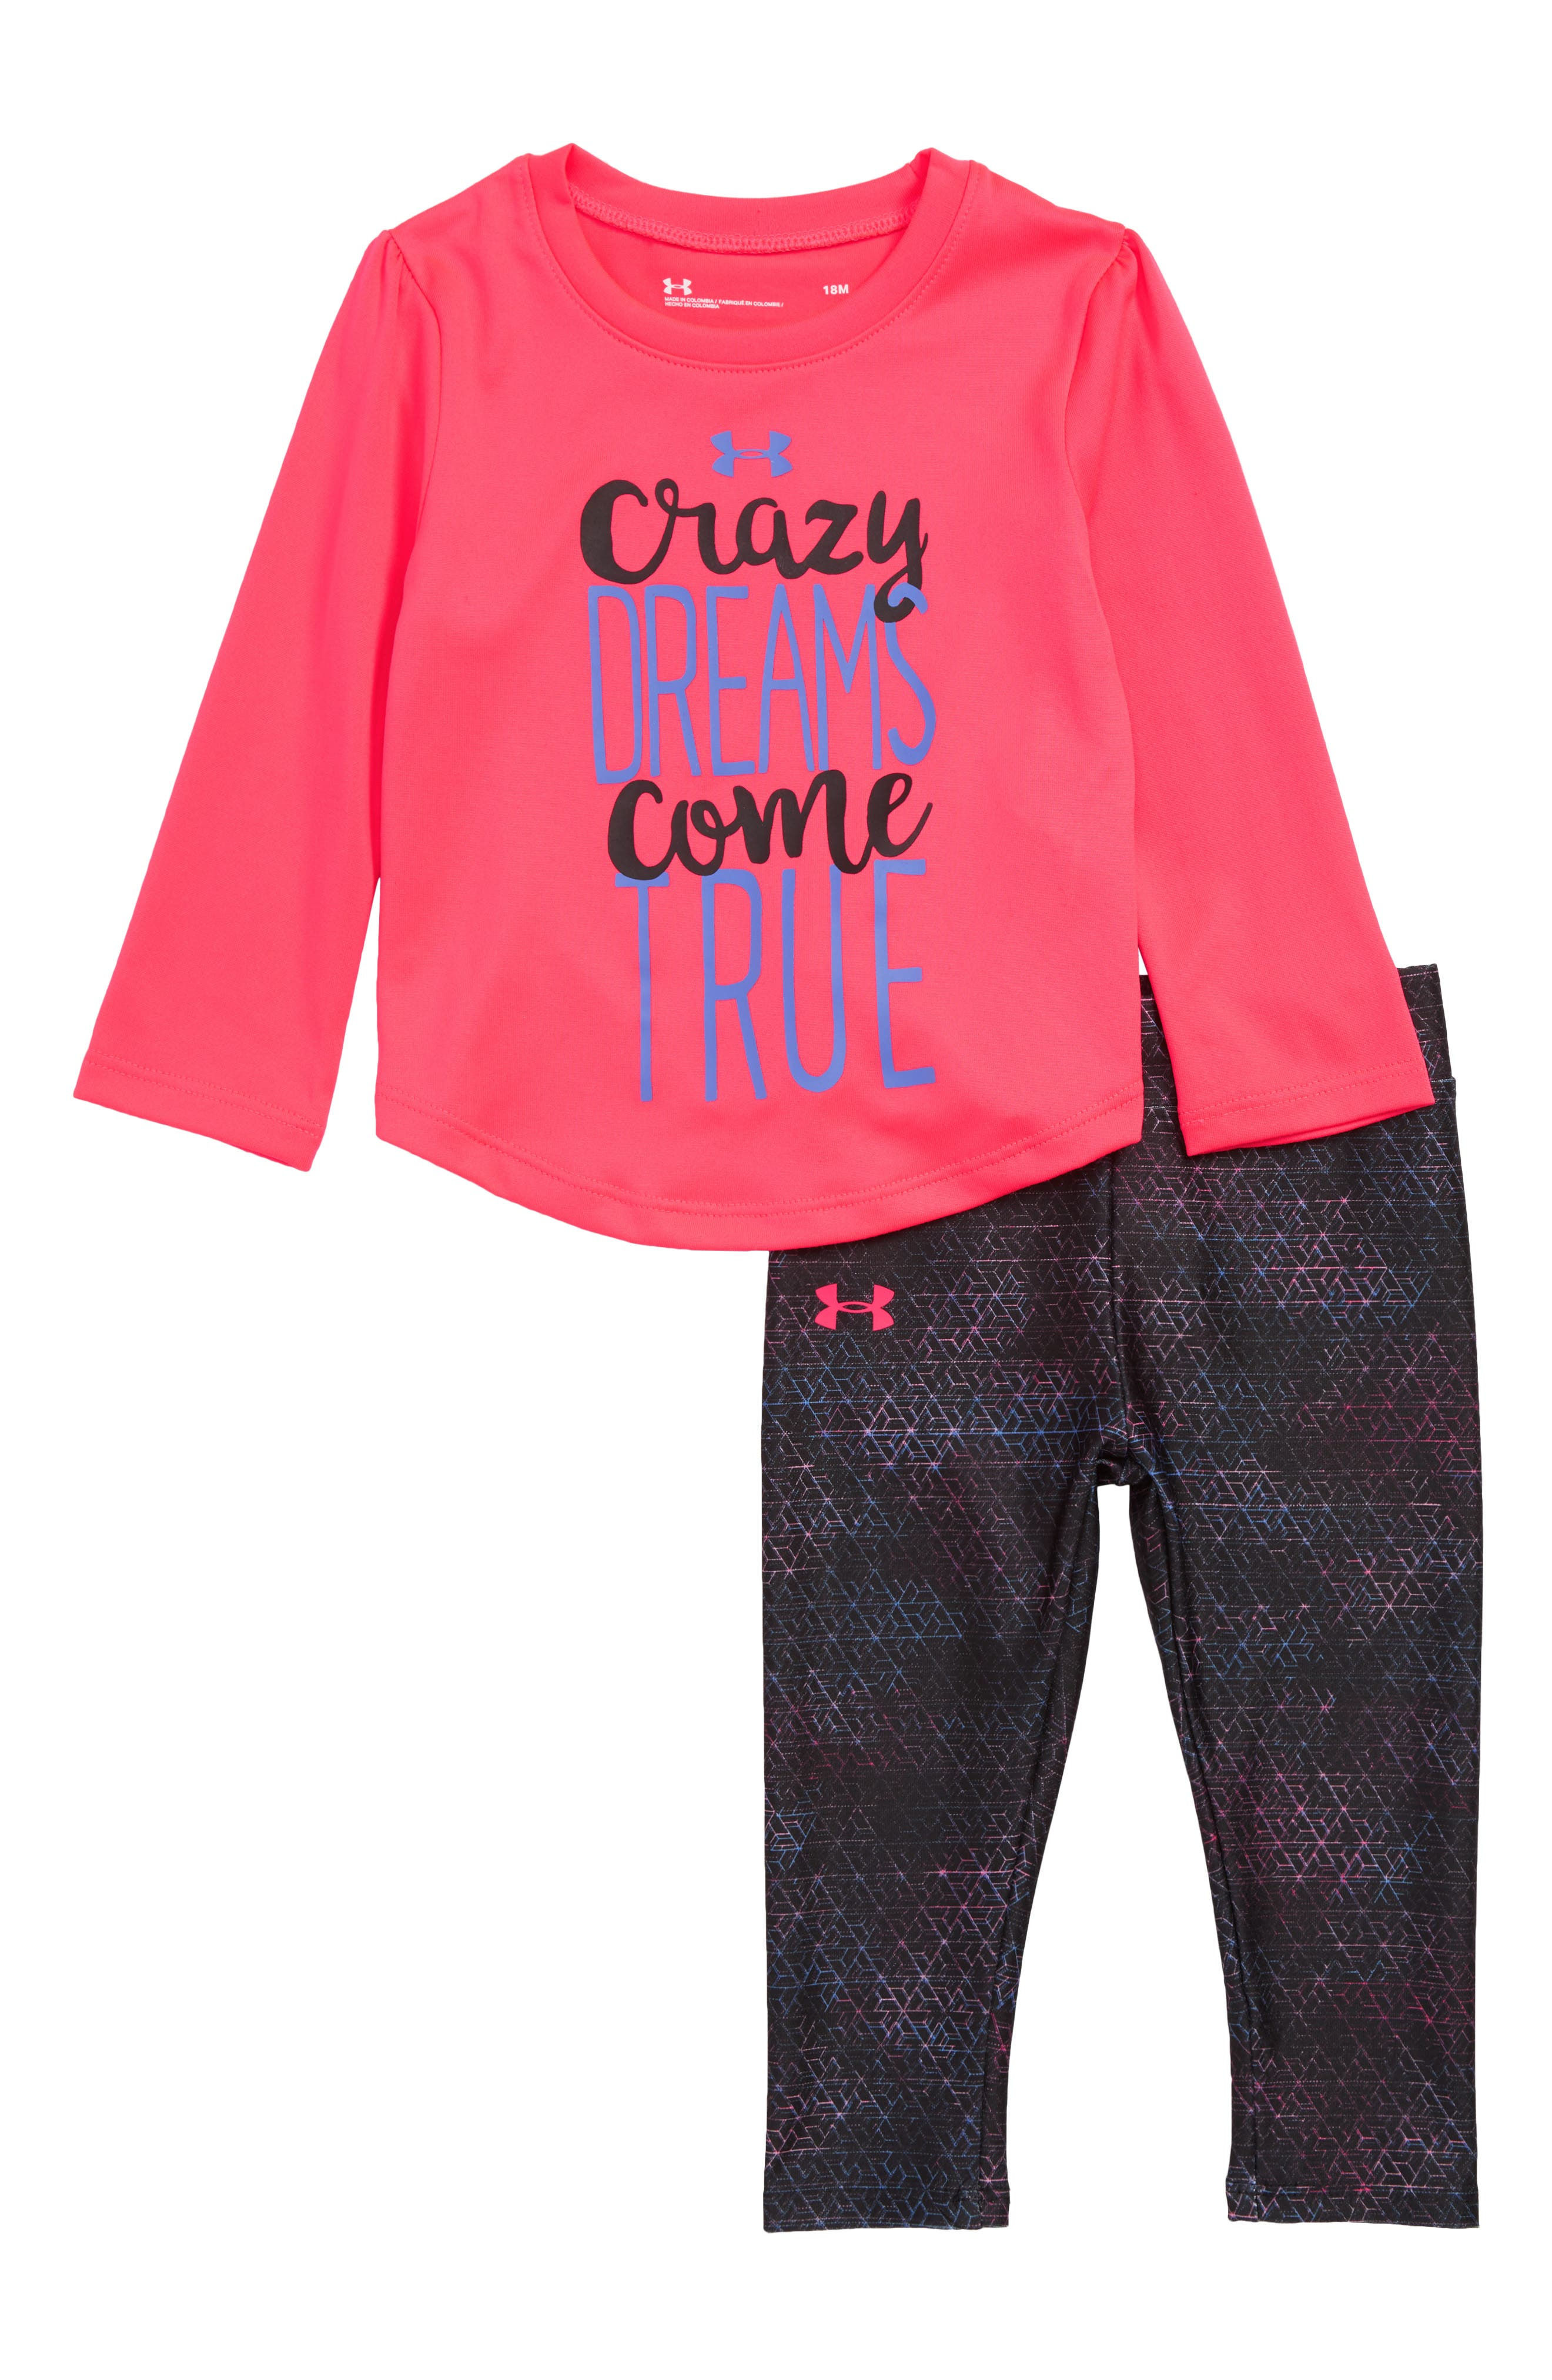 Infant Girls Under Armour Crazy Dreams Come True Tee  Leggings Set